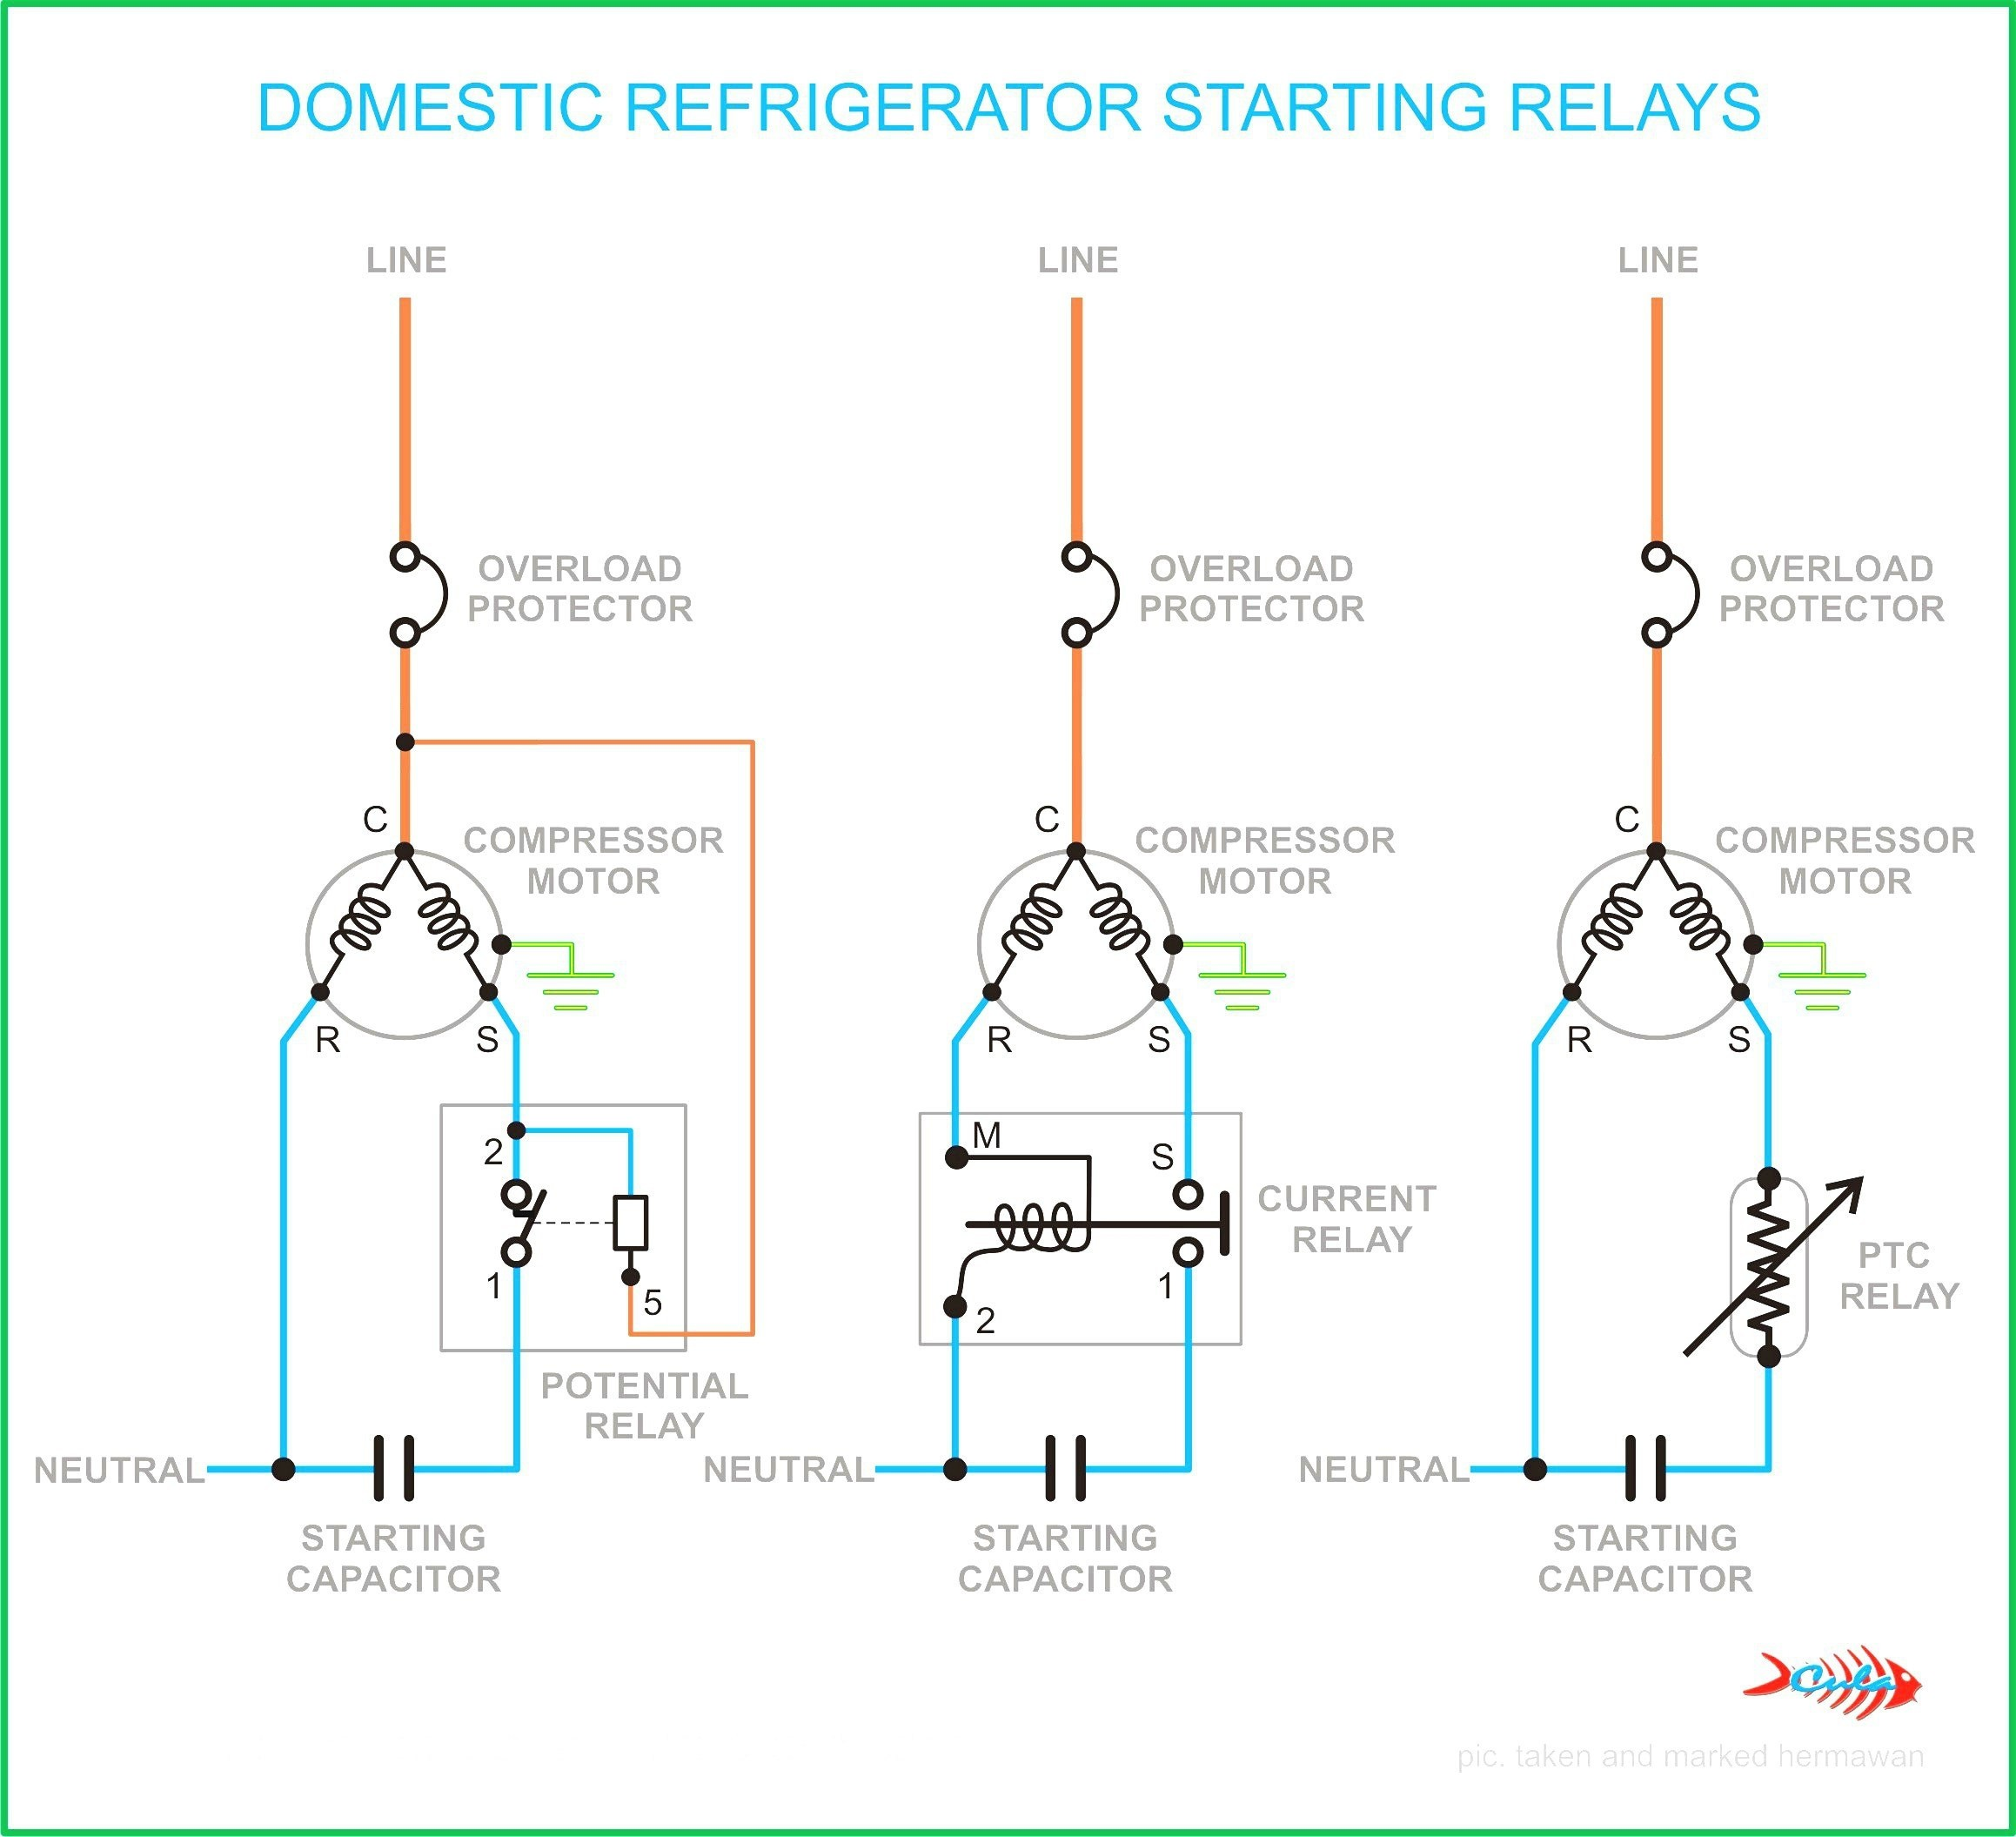 MR_8676] Ptc Relay Wiring Diagram Whirlpool Wiring DiagramDylit Lexor Rect Mohammedshrine Librar Wiring 101